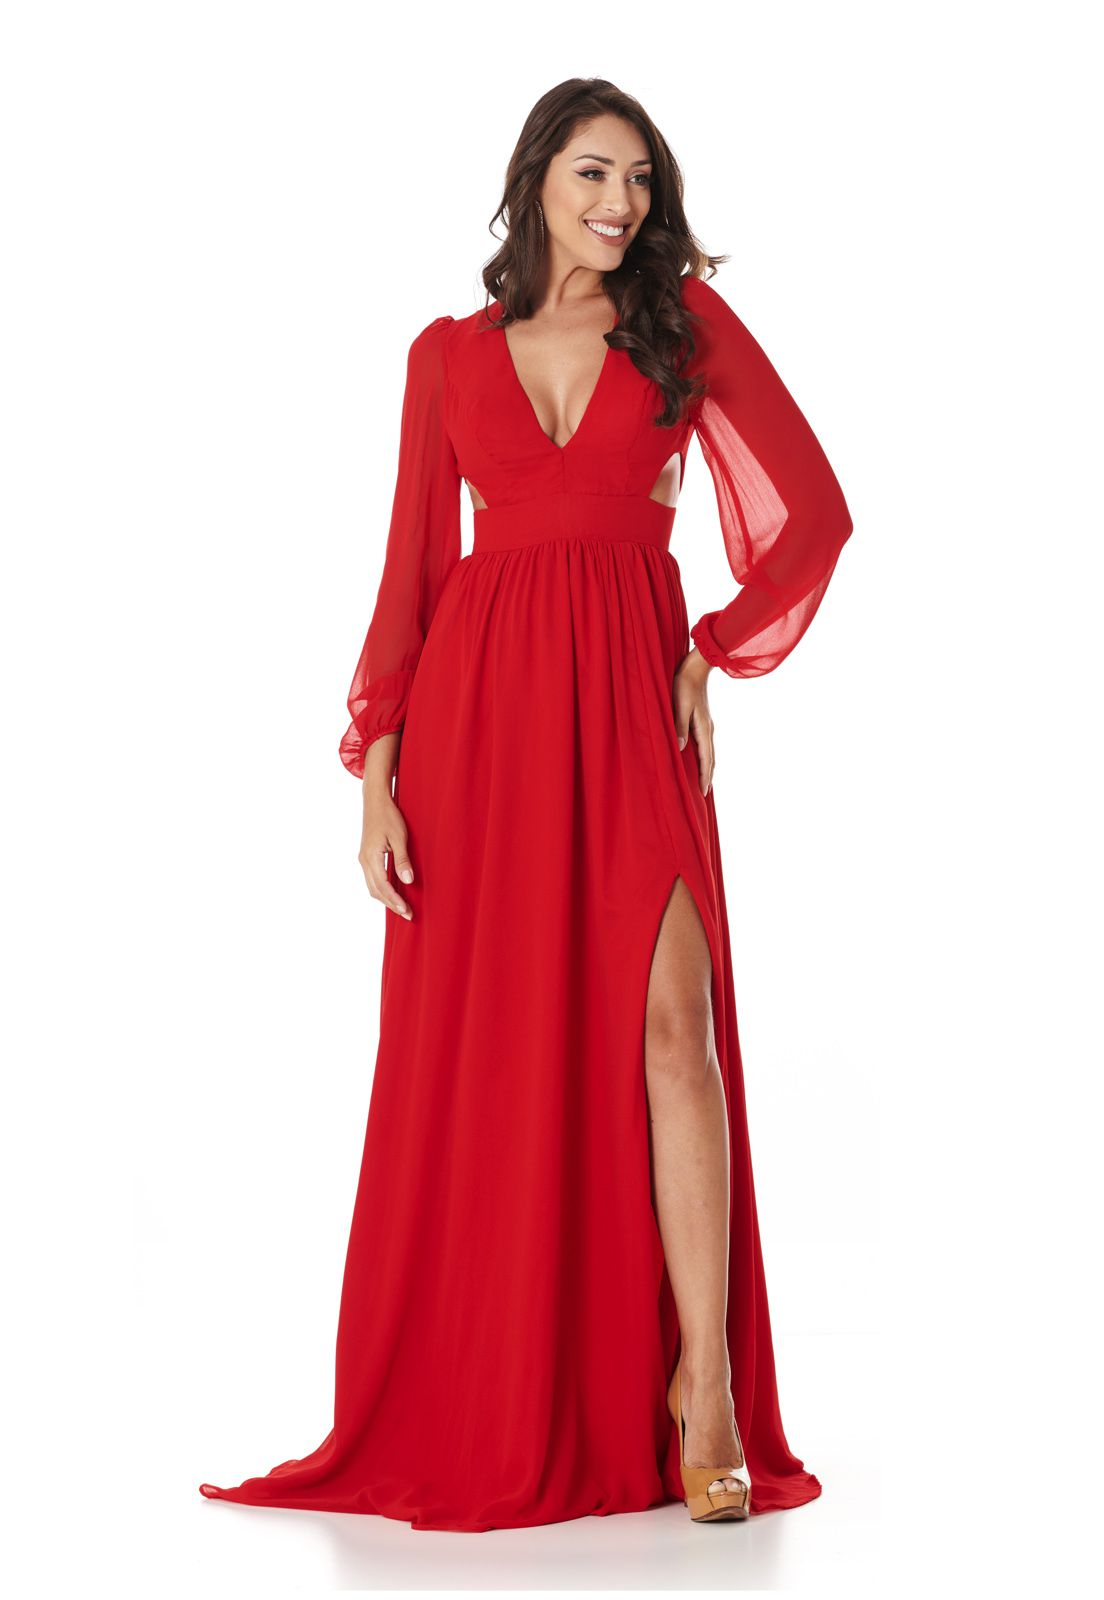 Vestido Longo Manga Longa Vermelho Lala Dubi